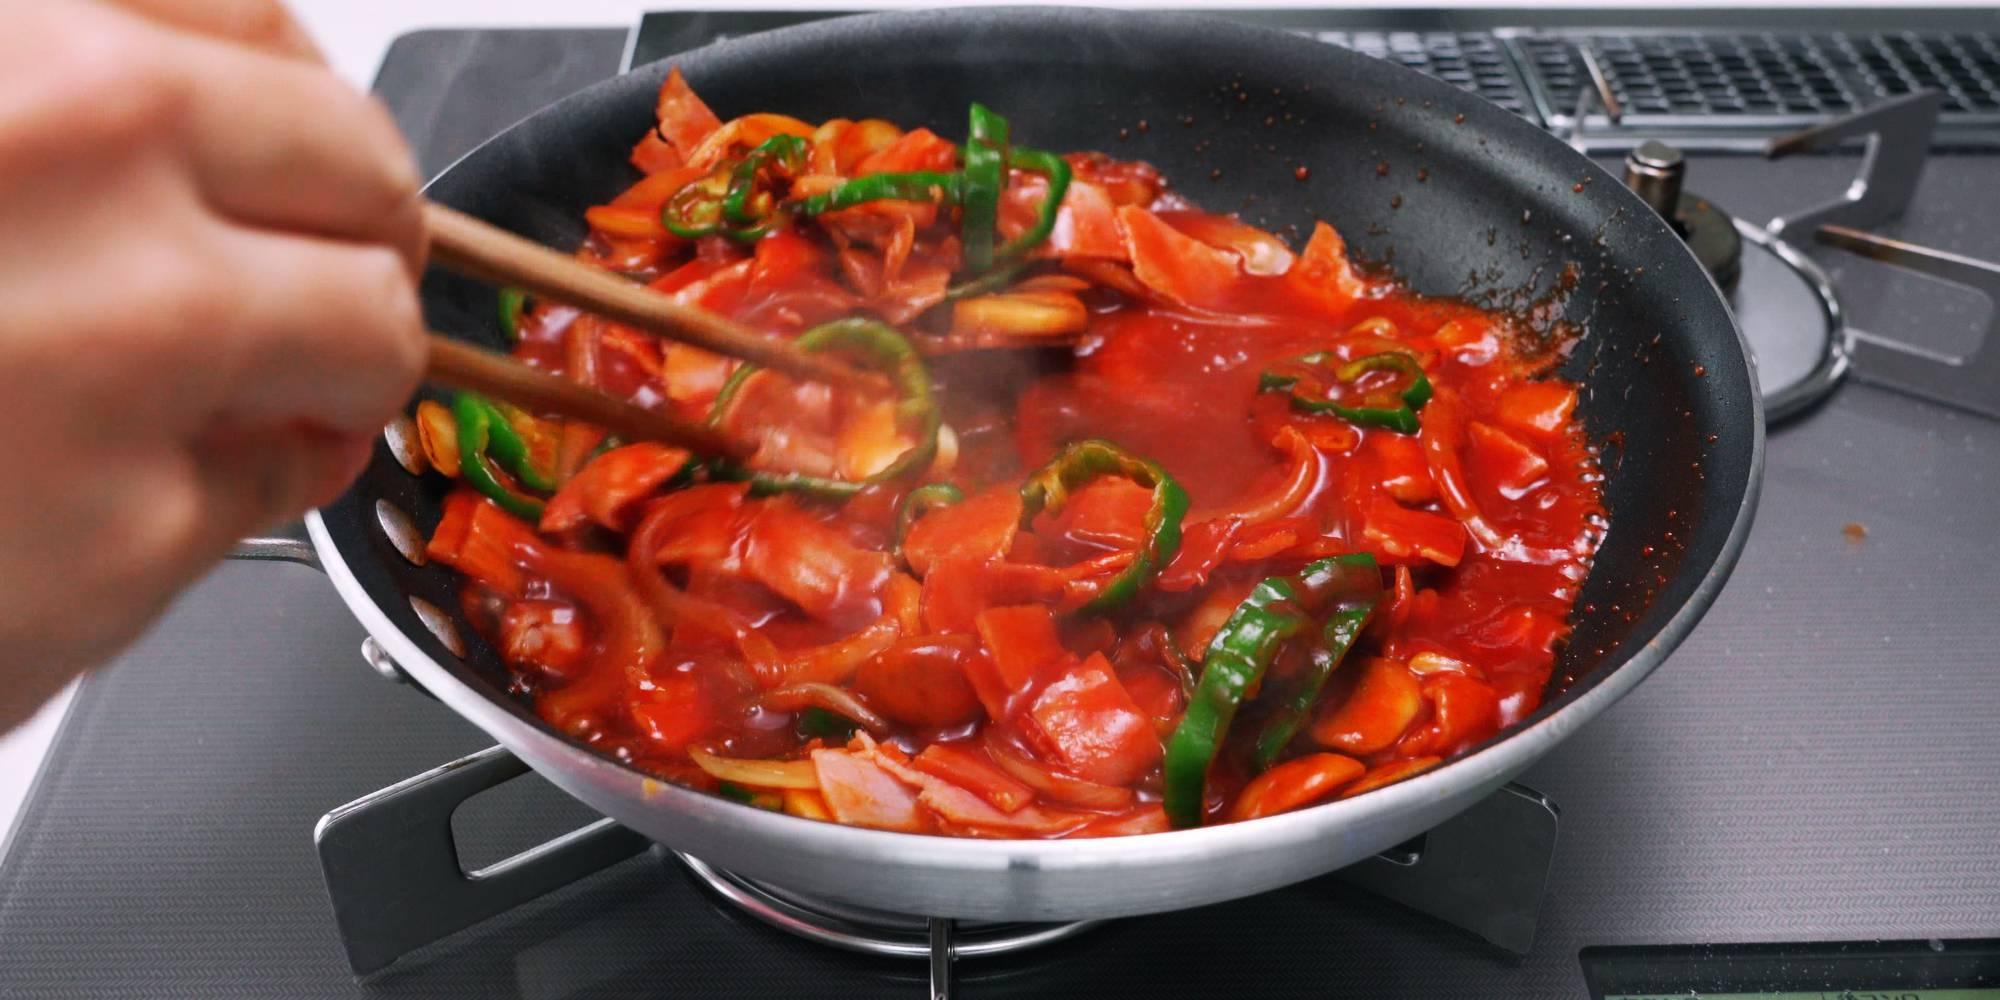 Spaghetti Napolitan sauce simmering in a frying pan.